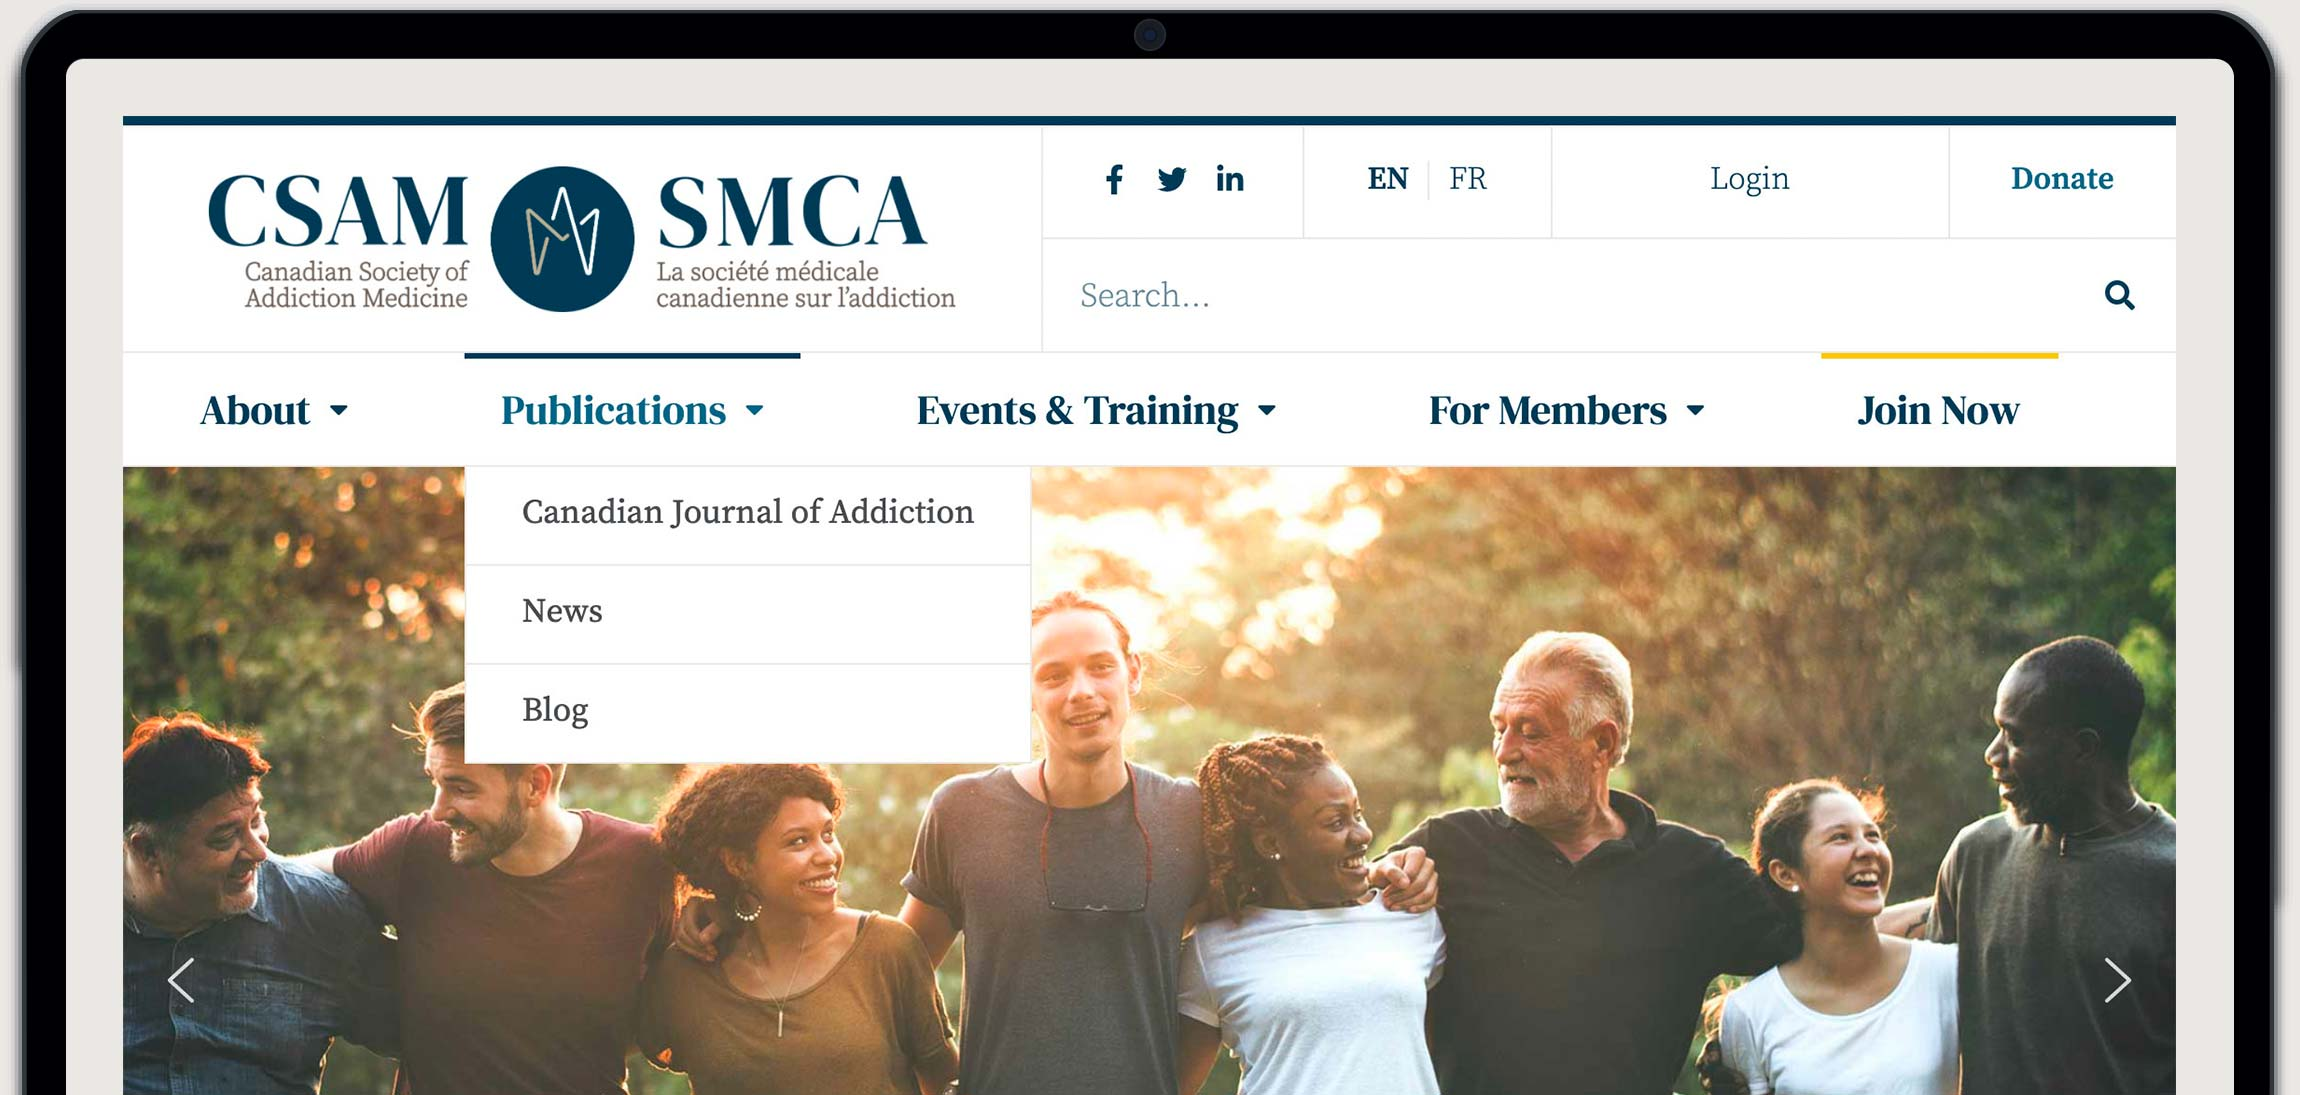 CSAM-SMCA Homepage Mock-up